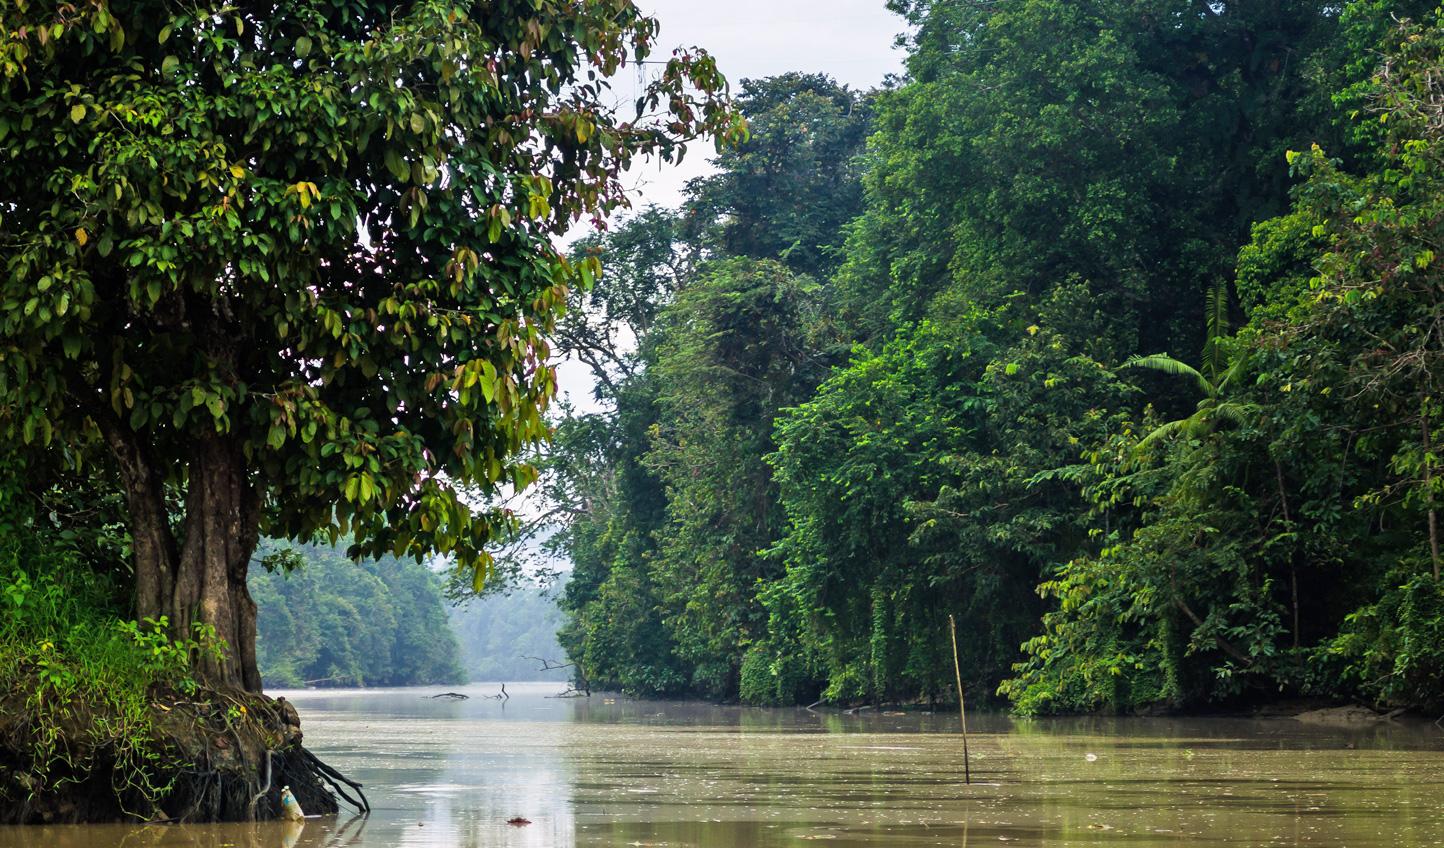 Cruise down the calm Kinabatangan River